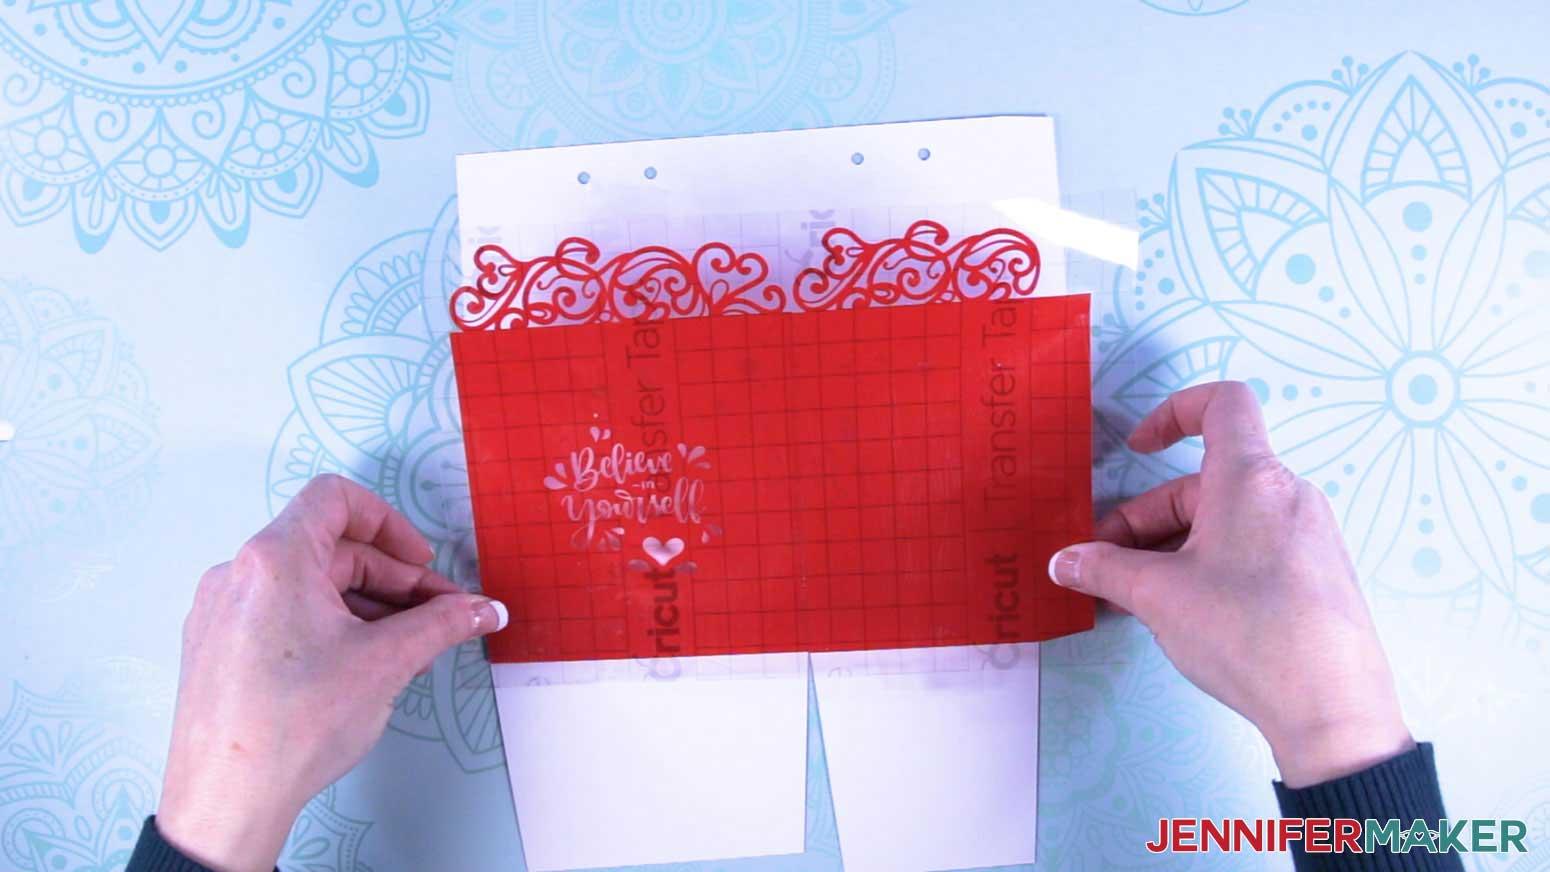 Align the decorative vinyl wrap to the milk carton gift box